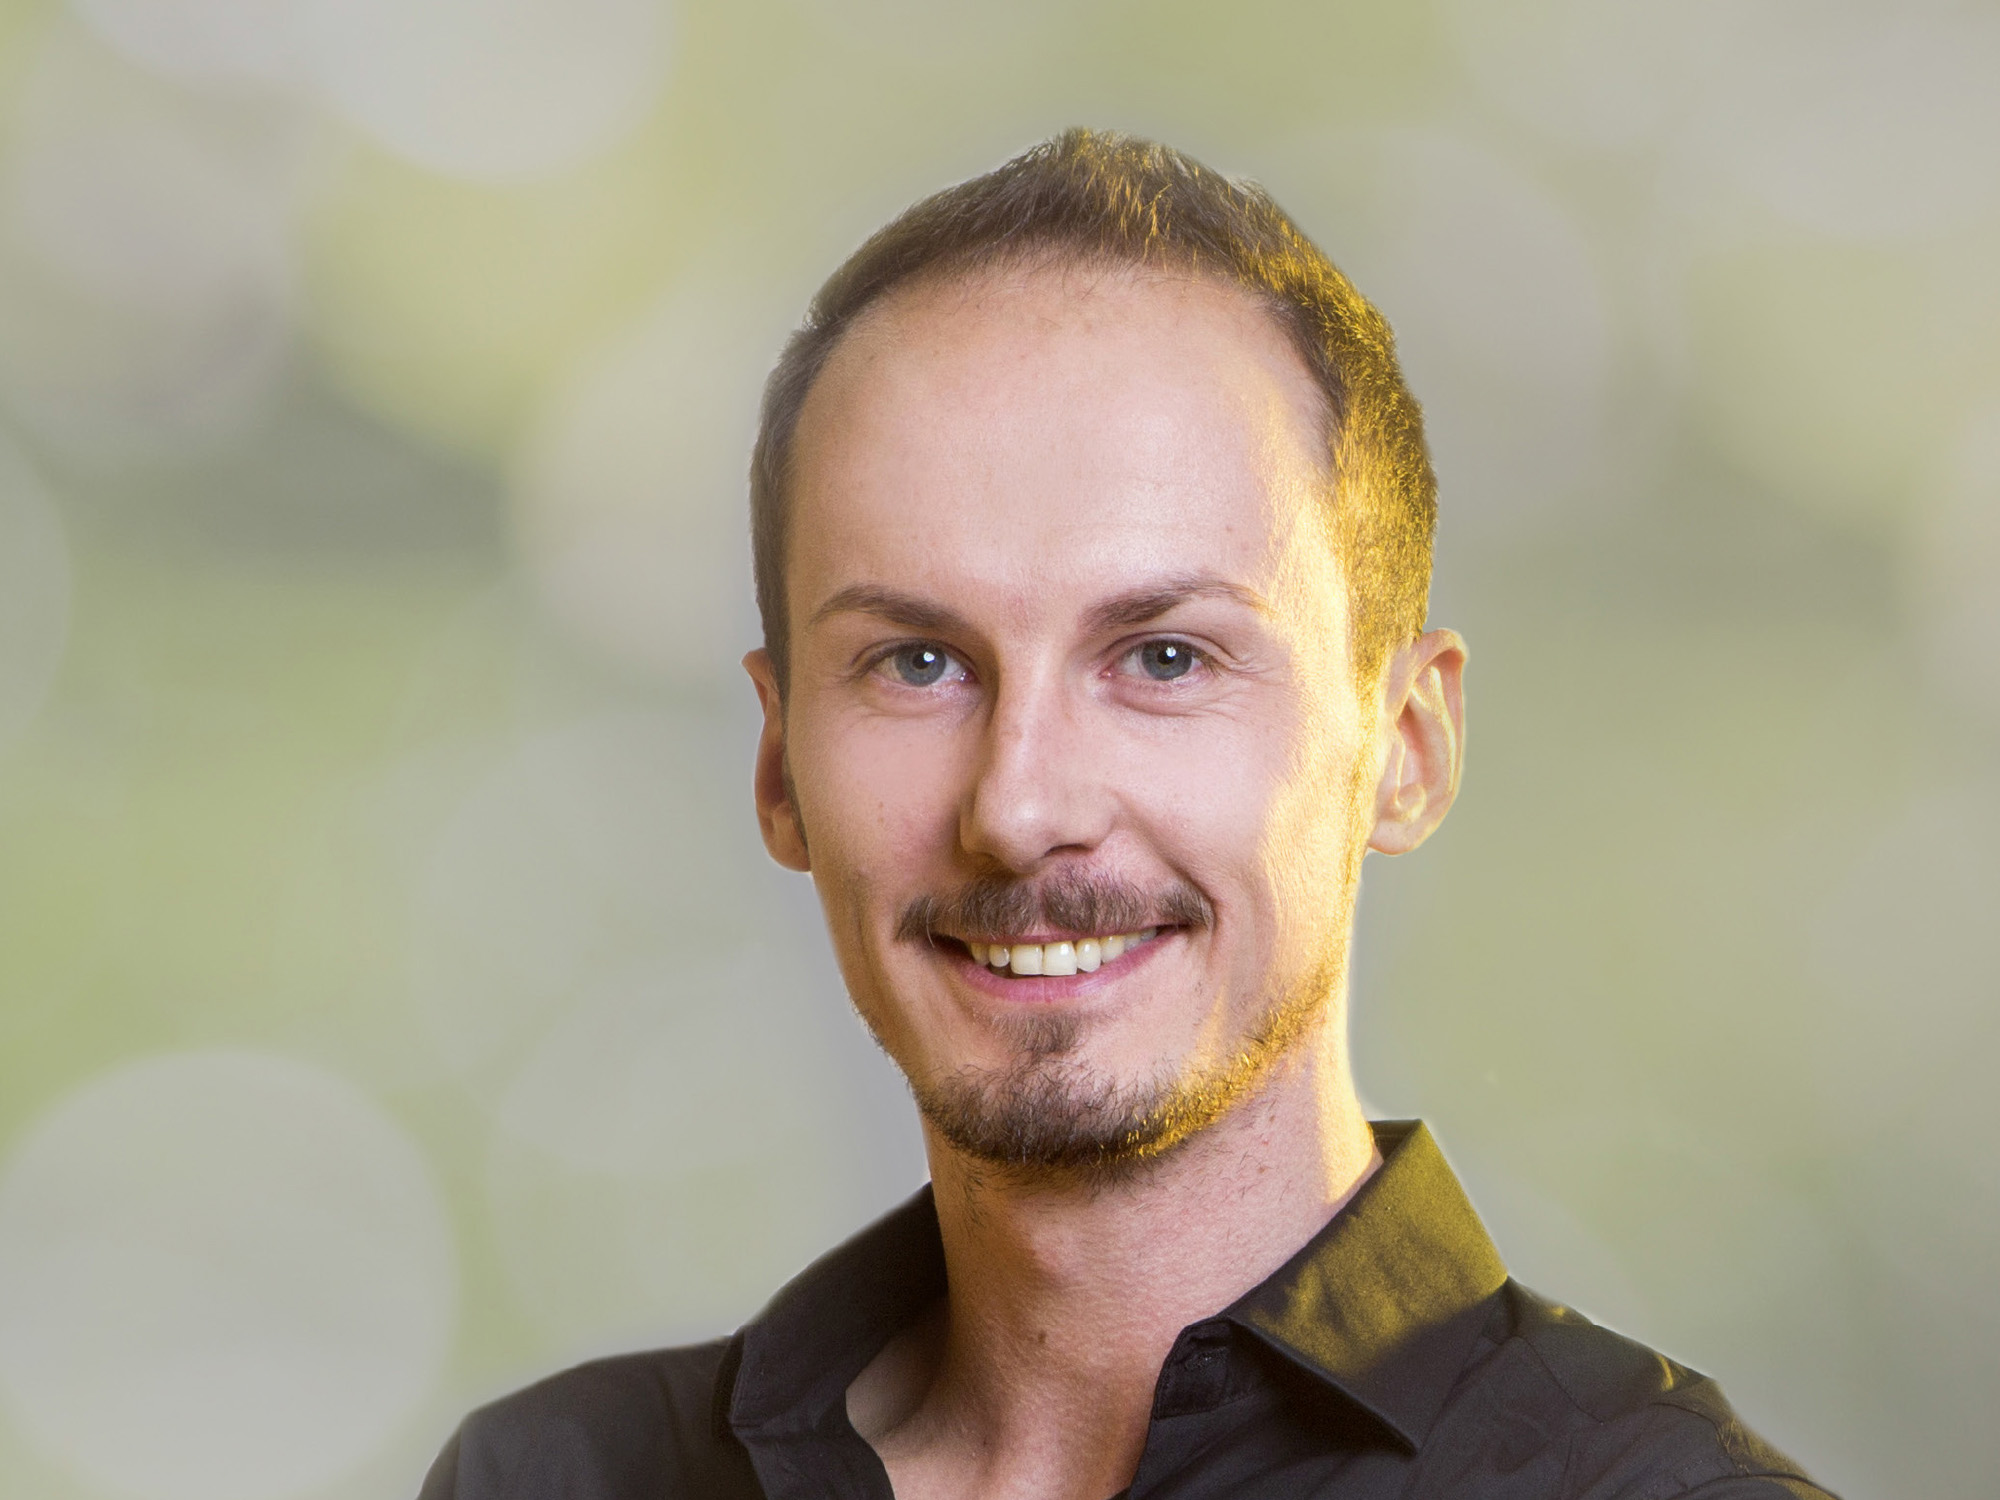 Benito Mangiapane, Topstylist · Daniel Schmid Friseure, Reutlingen